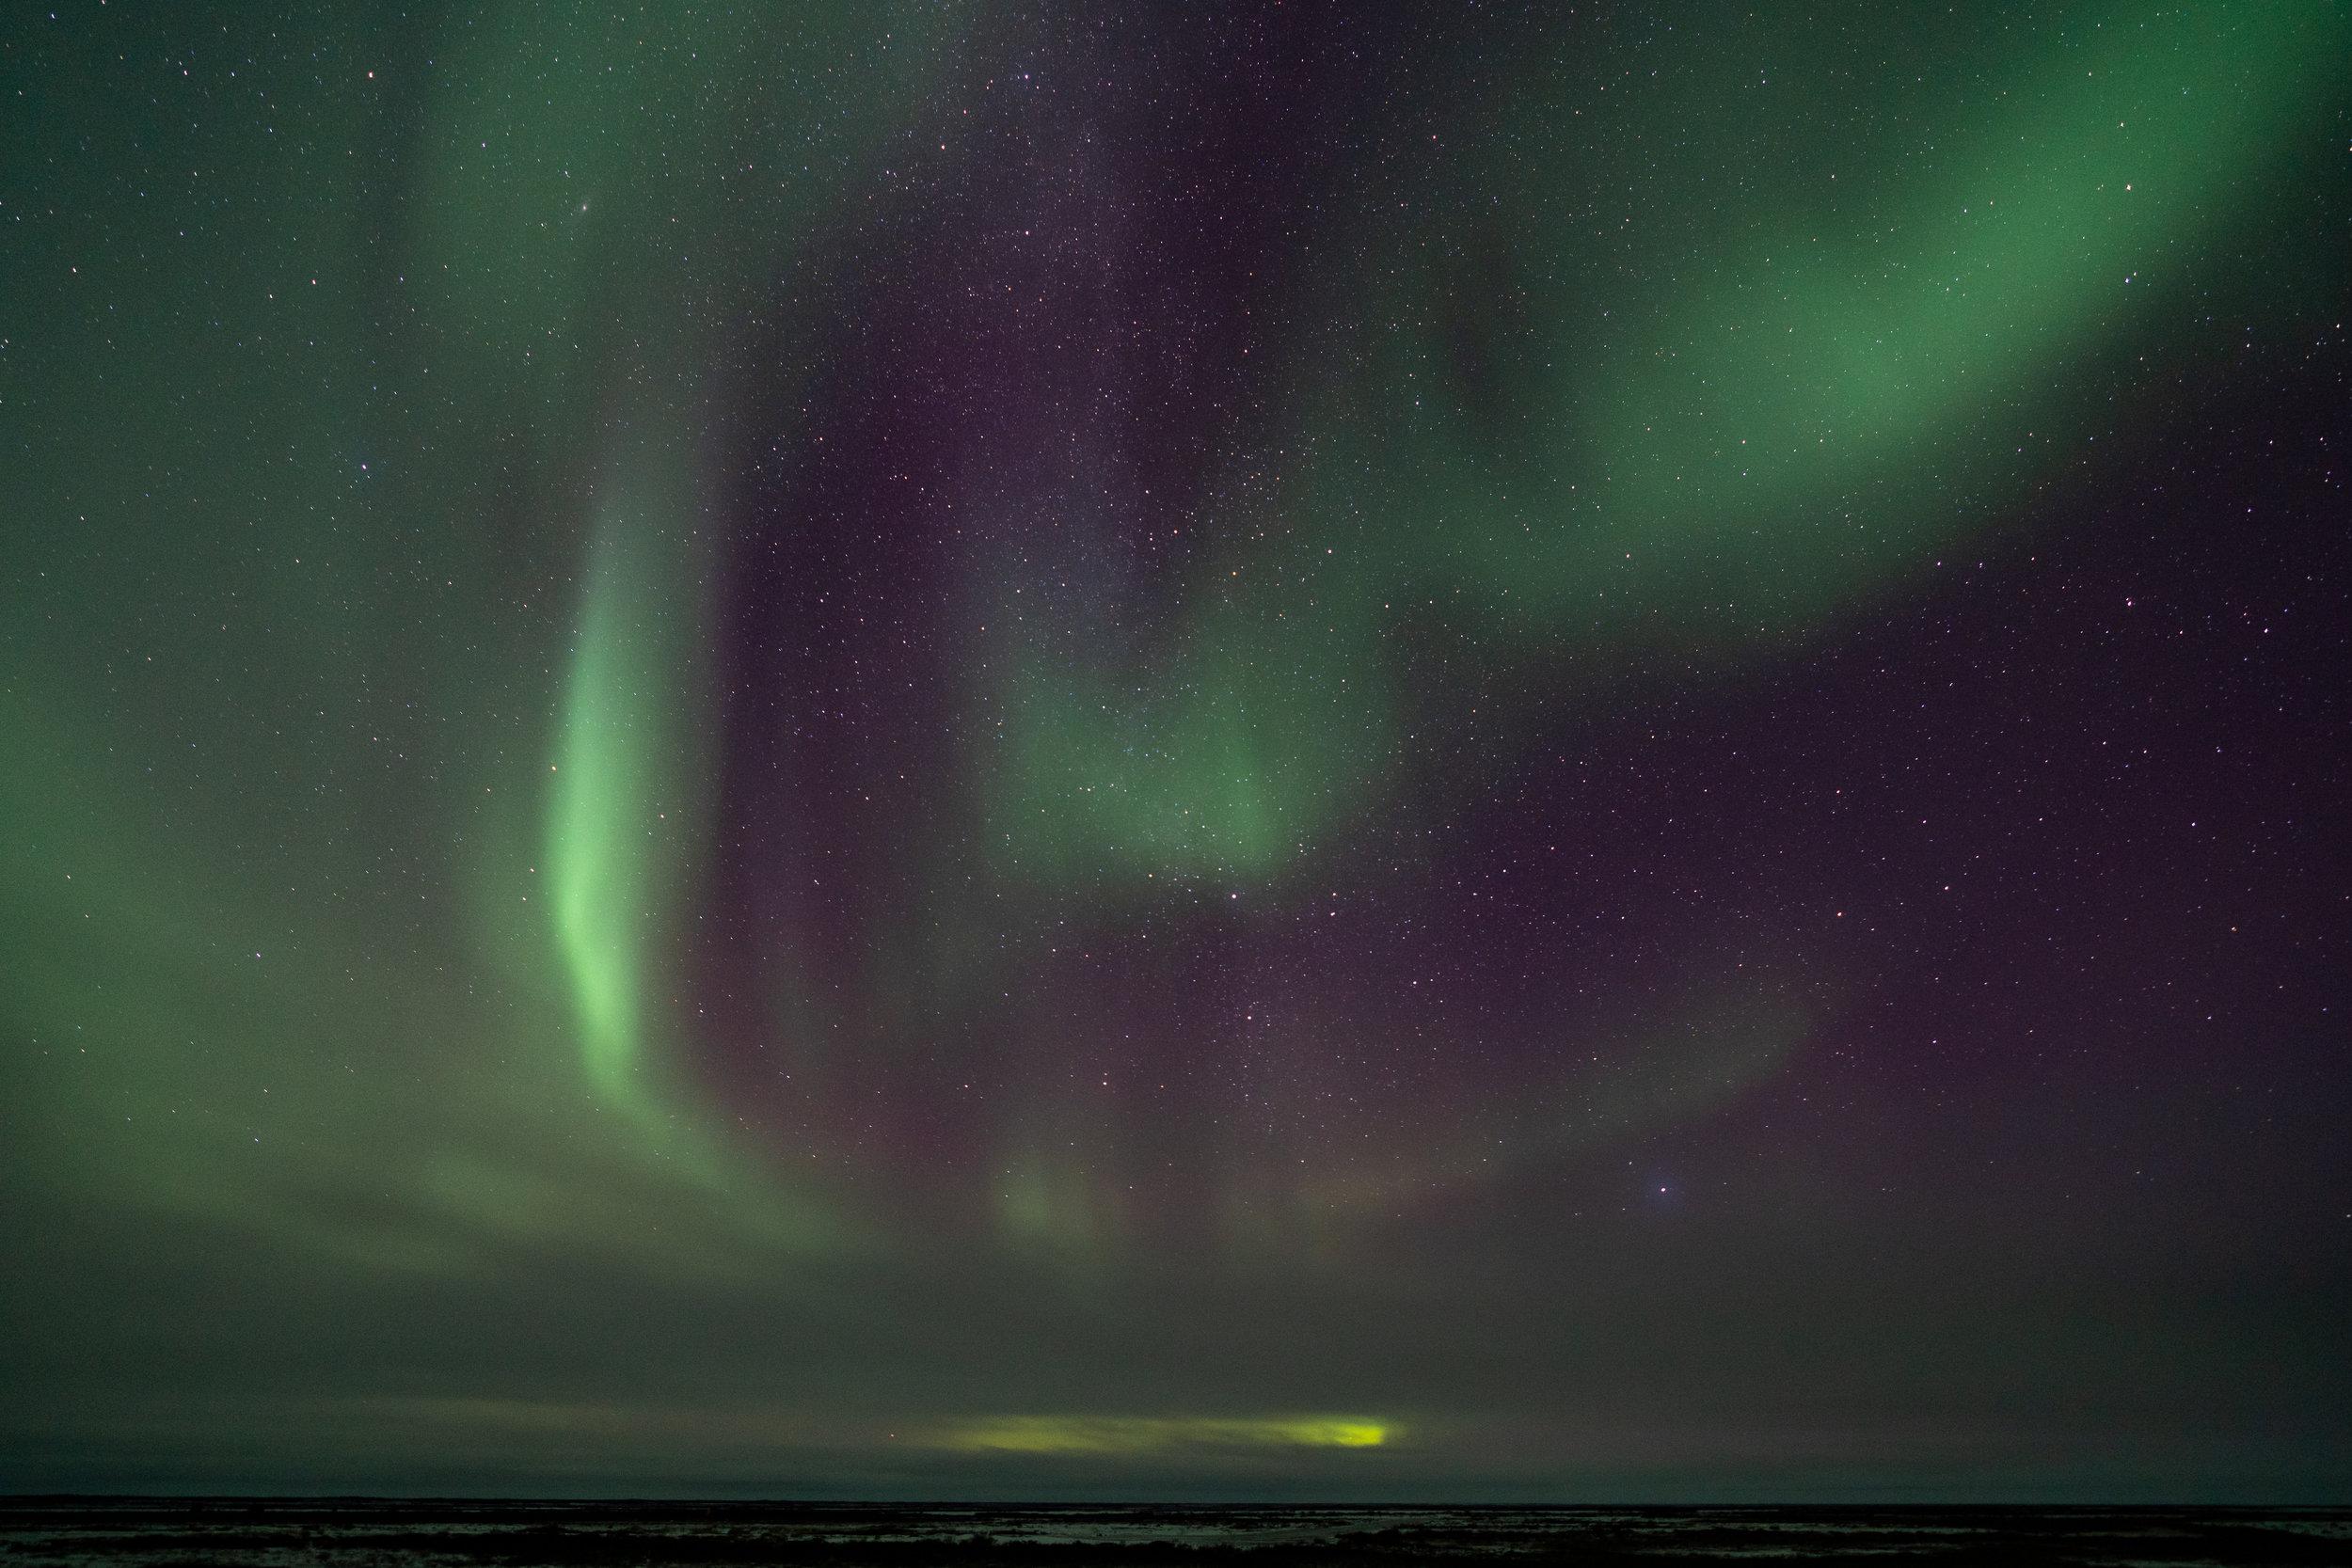 Stars & Northern Lights